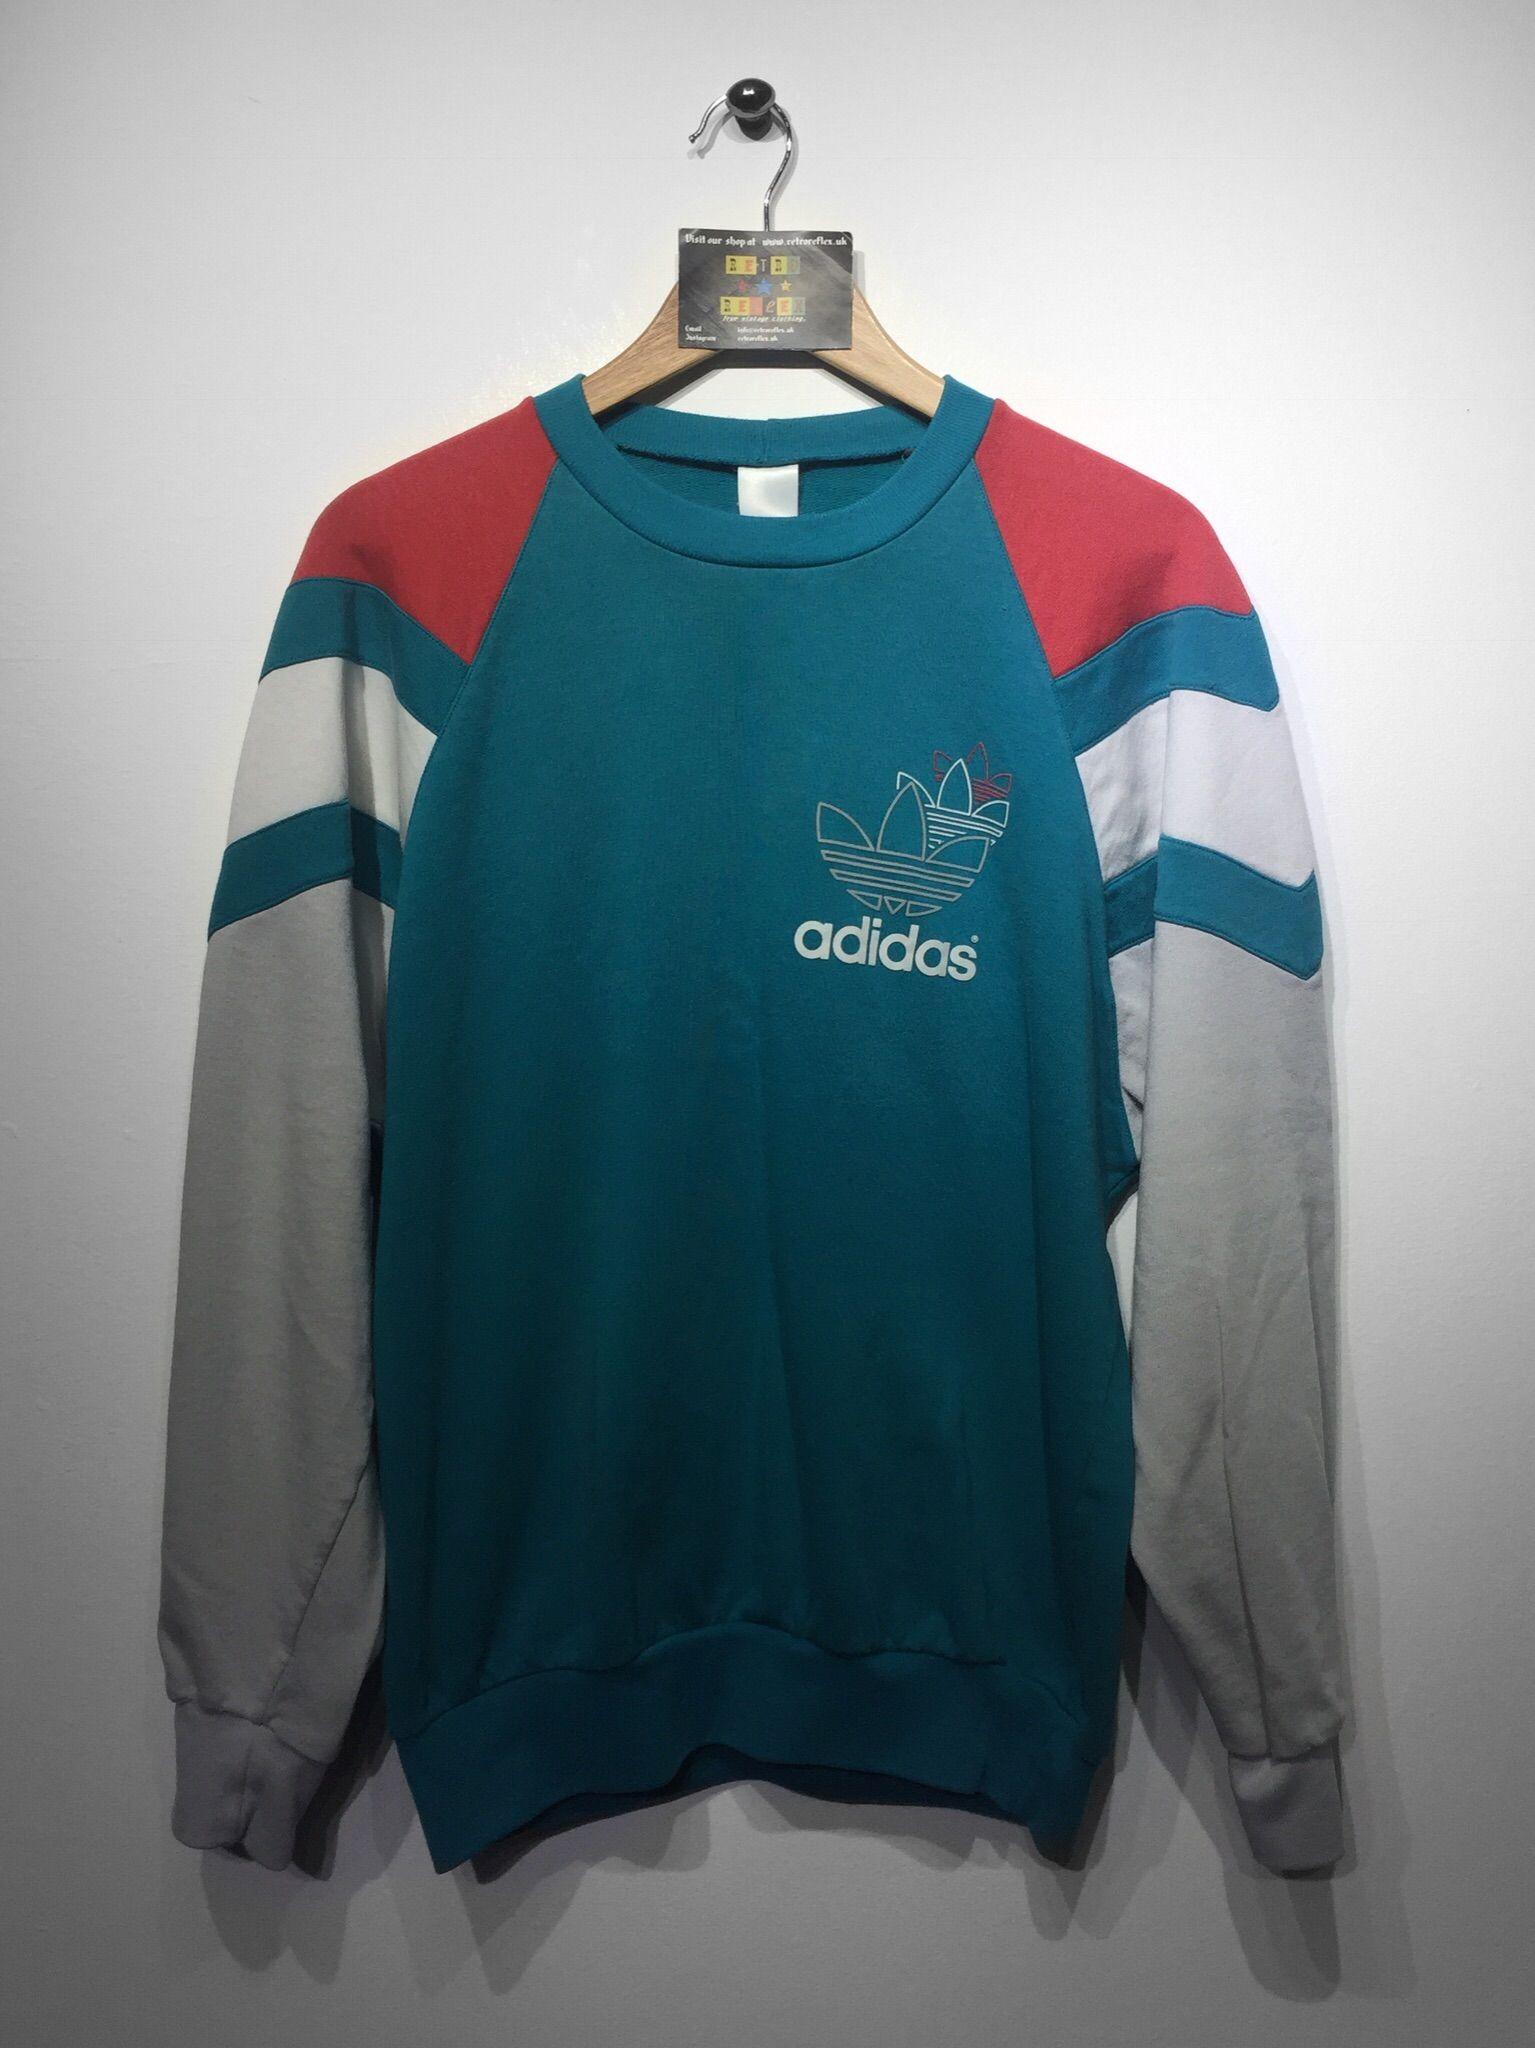 Adidas Sweatshirt Size Large 36 Website Www Retroreflex Uk Adidas Vintage Oldschool Retro Truevintage Adidas Pullover Herren Kleidung Pullover